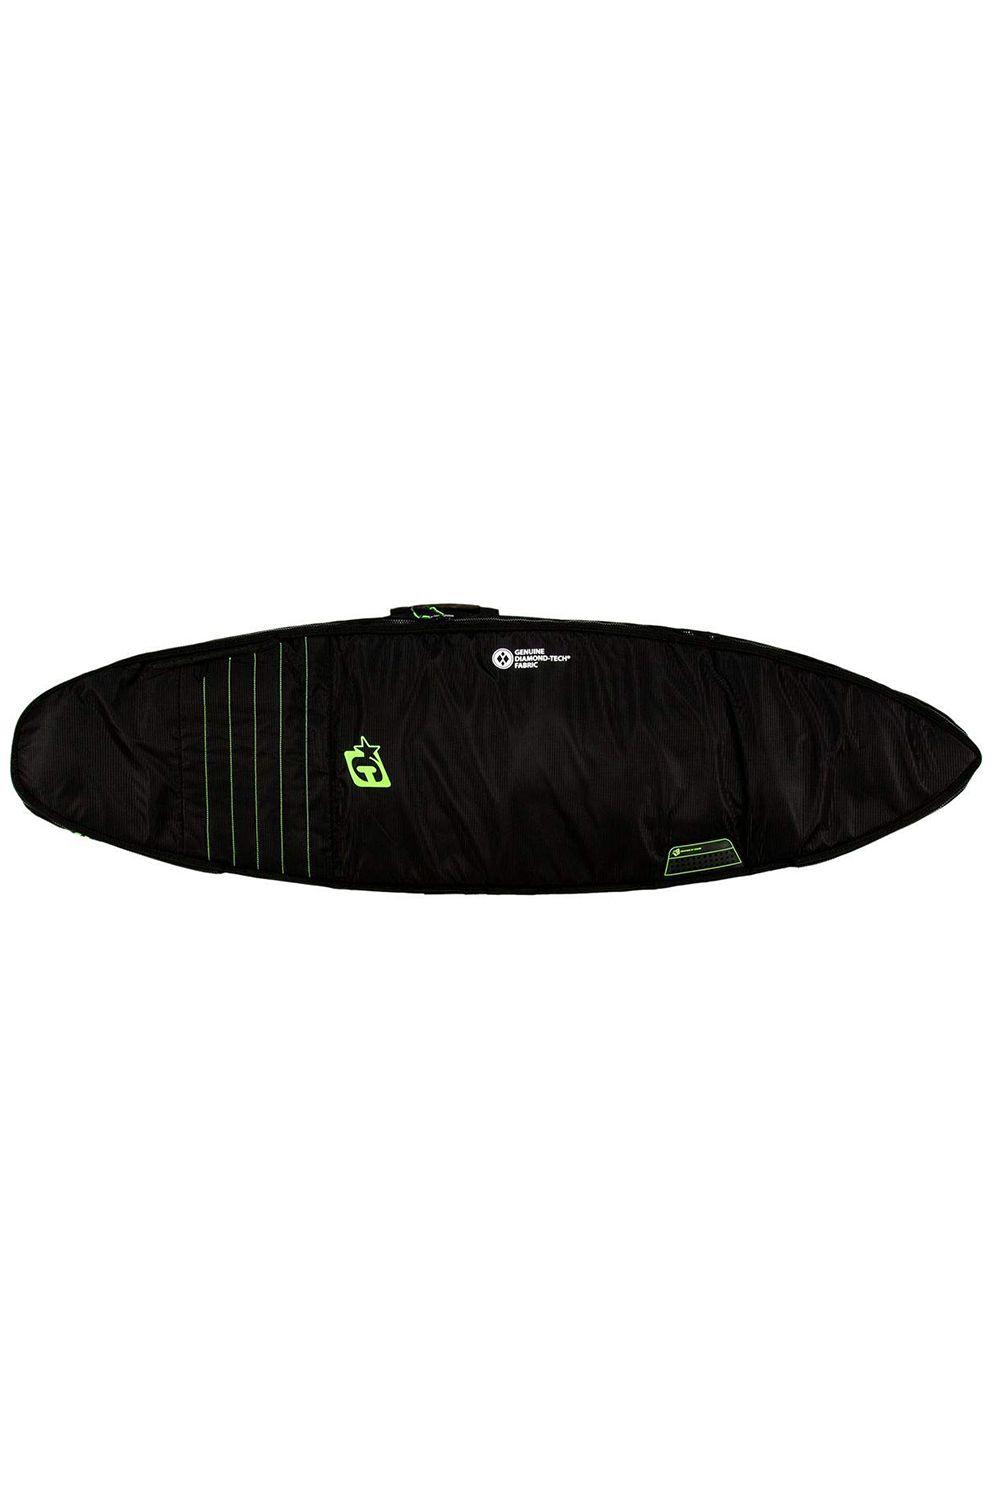 Creatures Boardbag 7'1 SHORTBOARD DOUBLE Black Lime